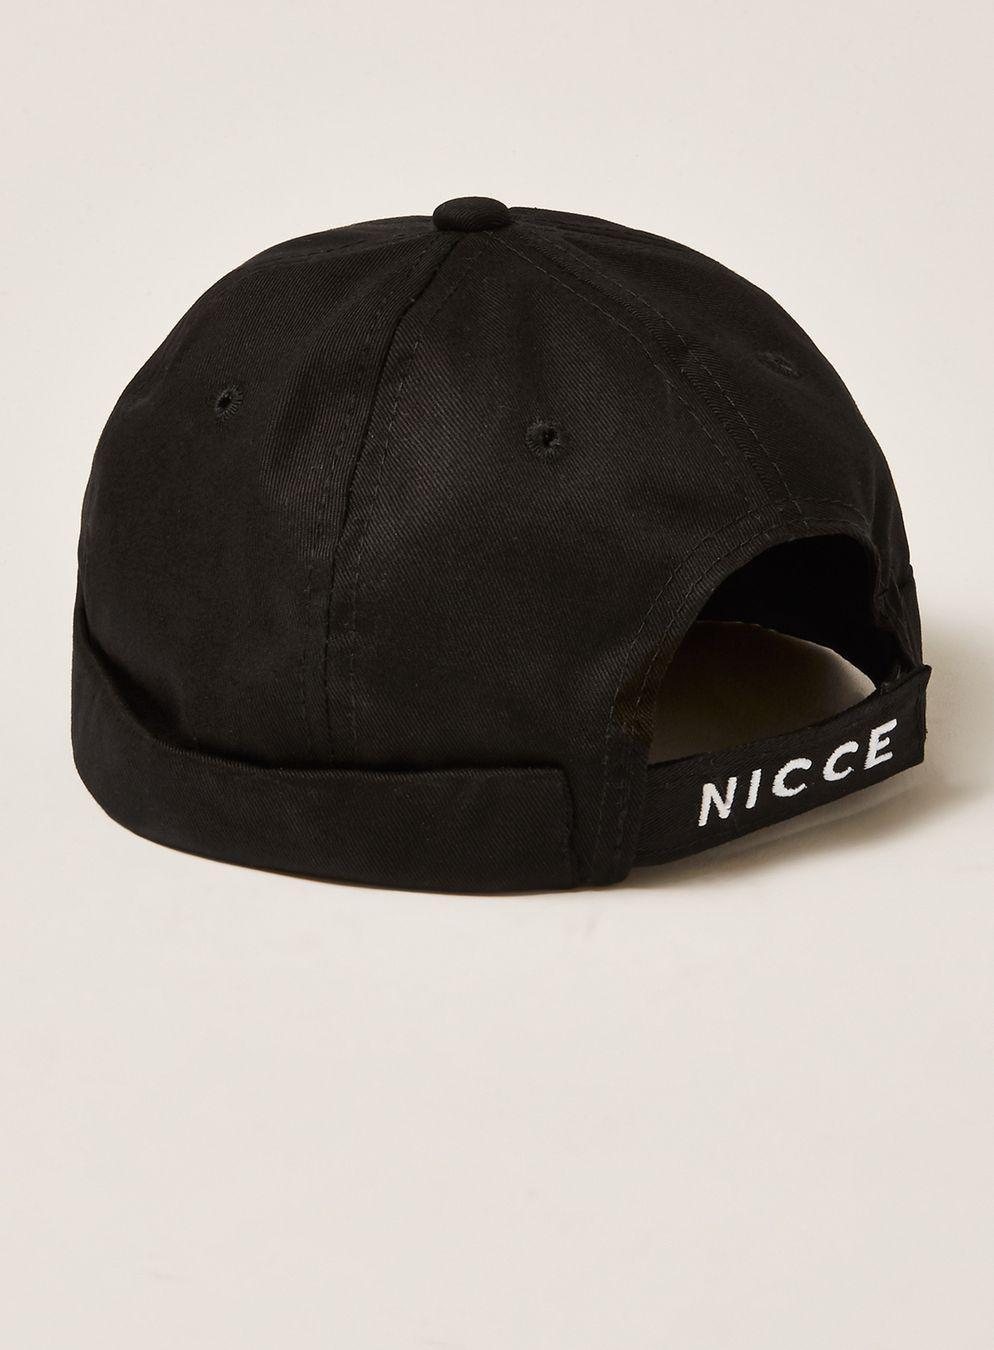 size 40 f48c5 5bcb3 TOPMAN Nicce Black Mini Docker Hat in Black for Men - Lyst